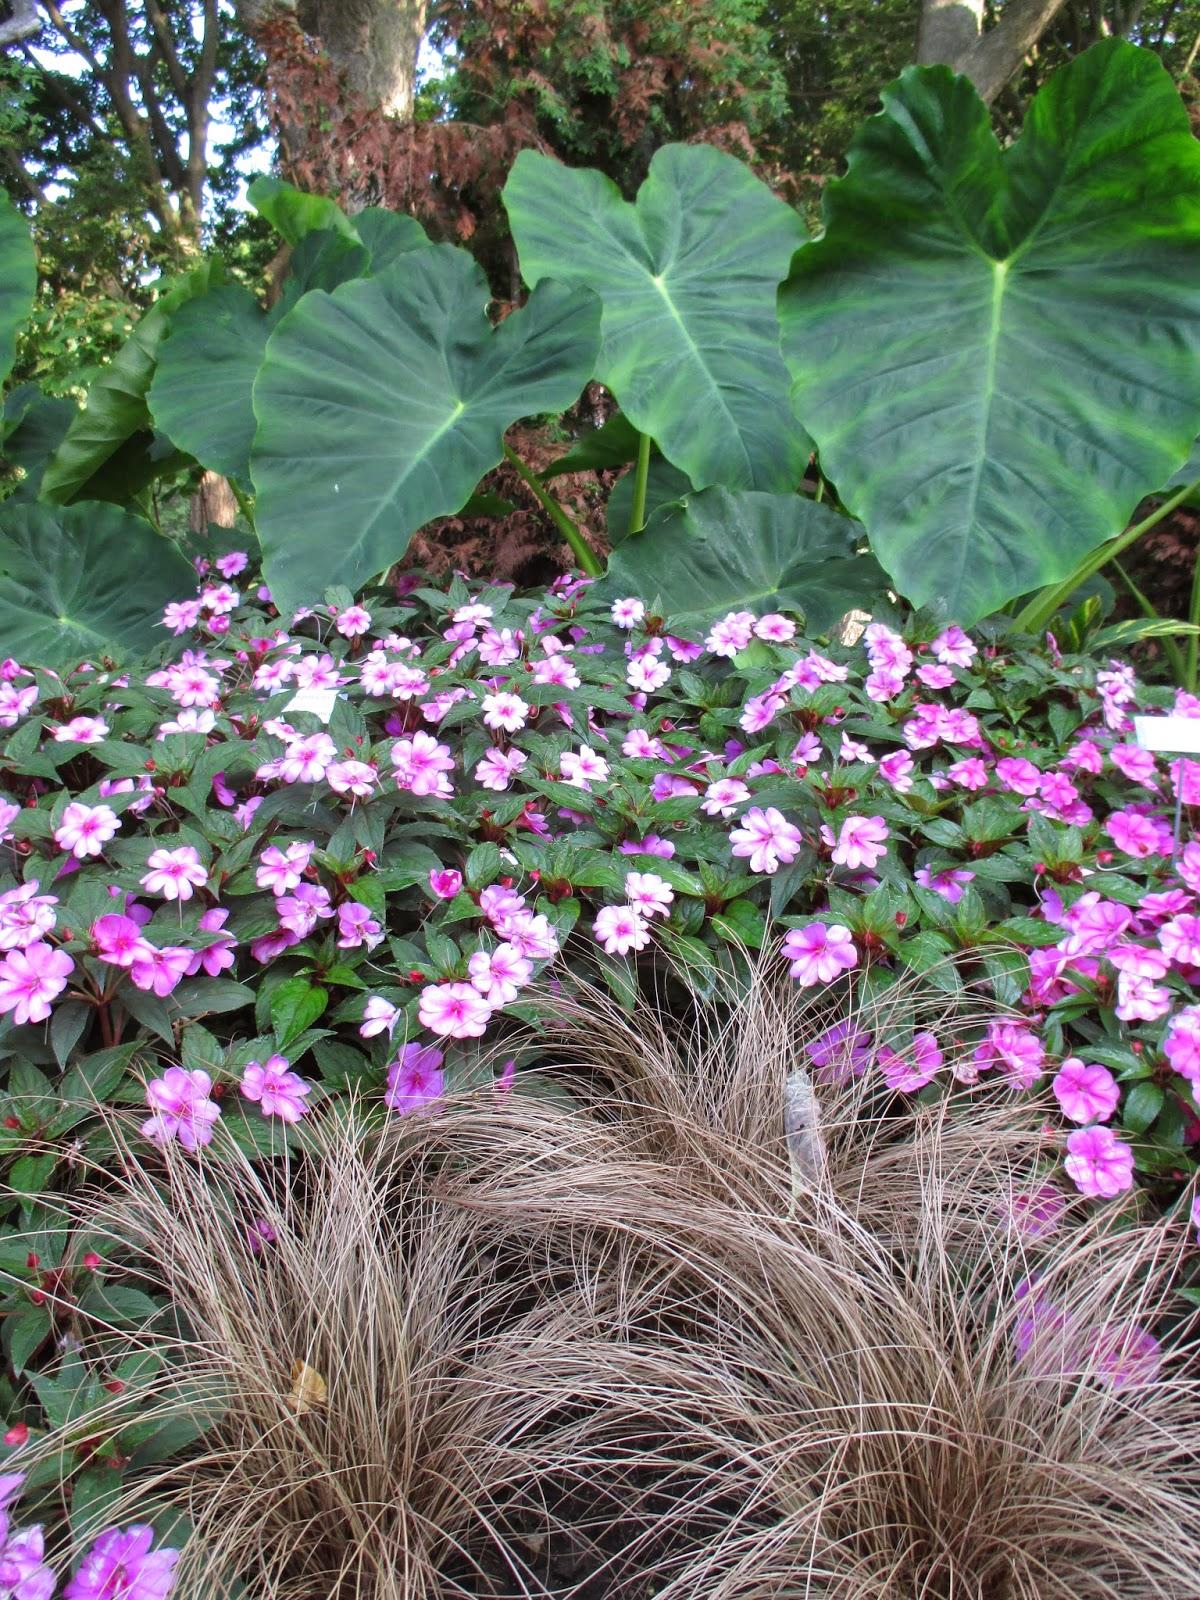 Kgk Gardening Landscape: Hort Blog: The Jungle Garden